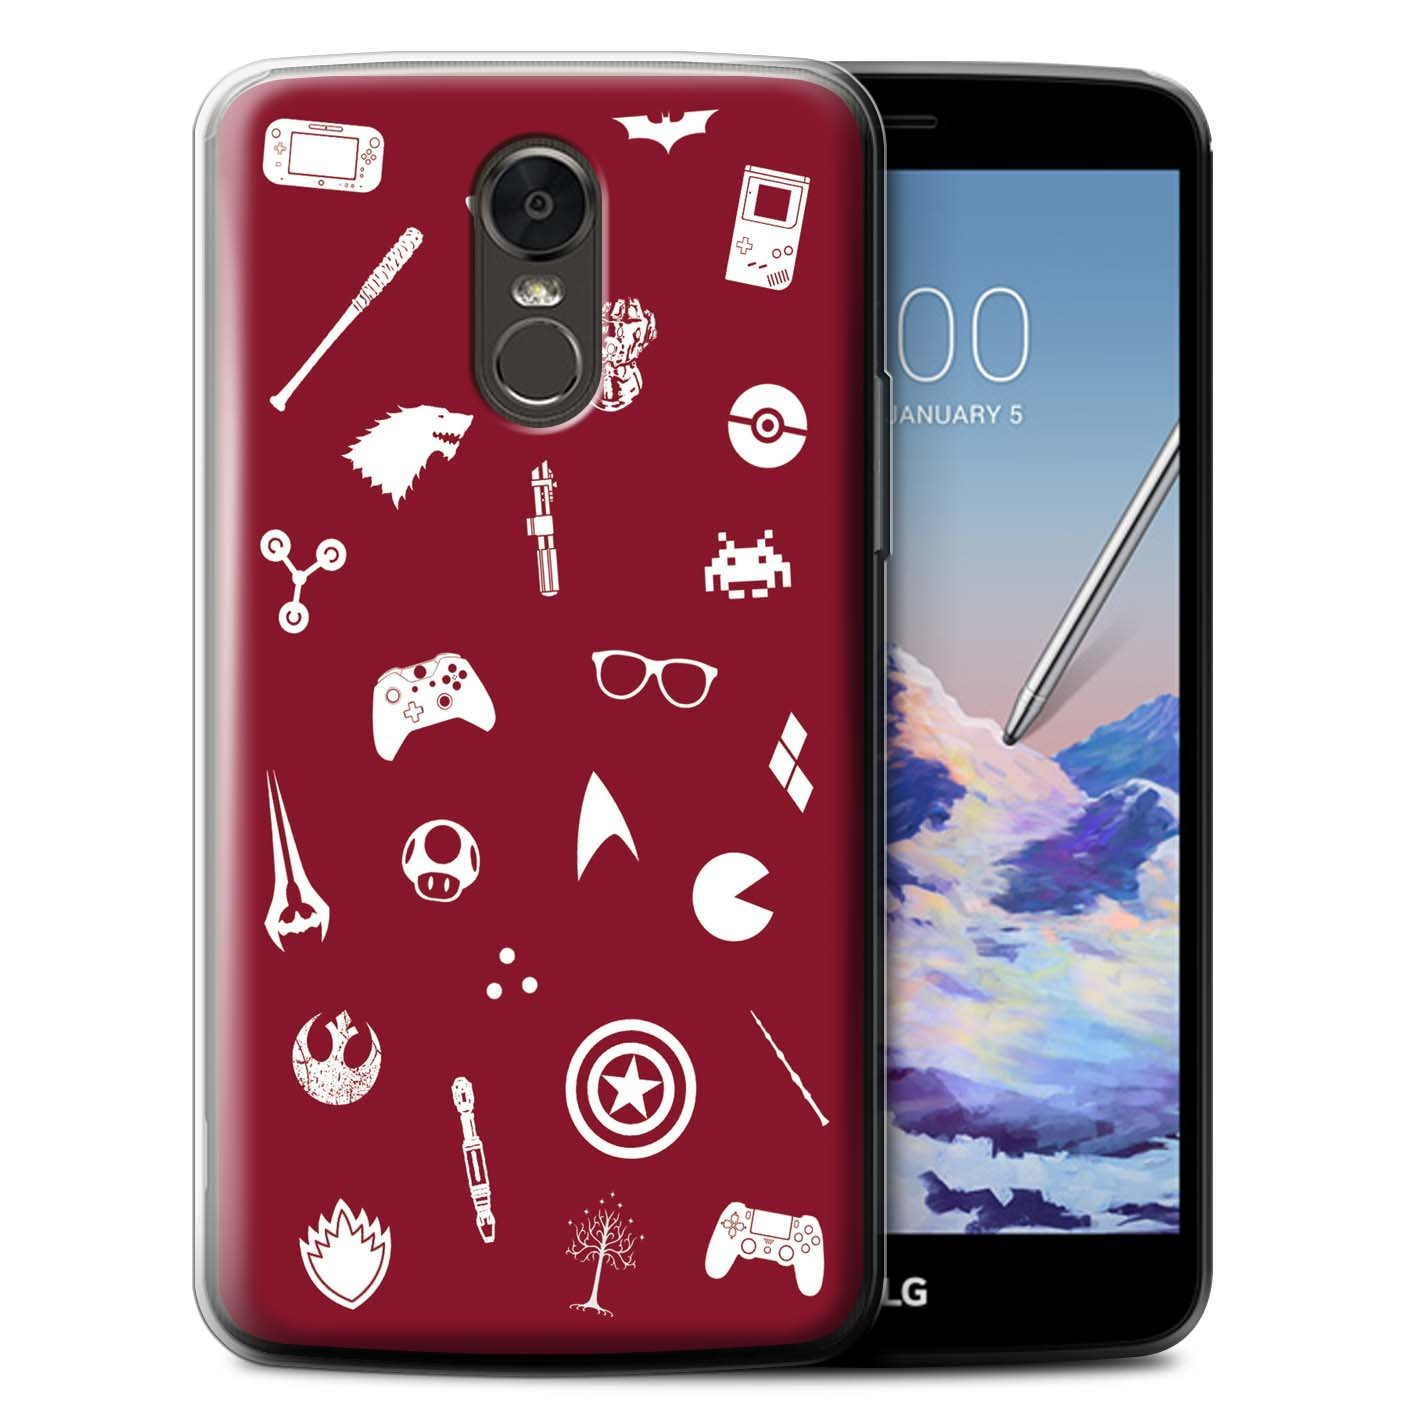 Phone Case for LG Stylus 3/Stylo 3/K10 Pro Geek Nerdy Gamer Fan Inner Geek/Stickers Design Transparent Clear Ultra Soft Flexi Silicone Gel/TPU Bumper Cover